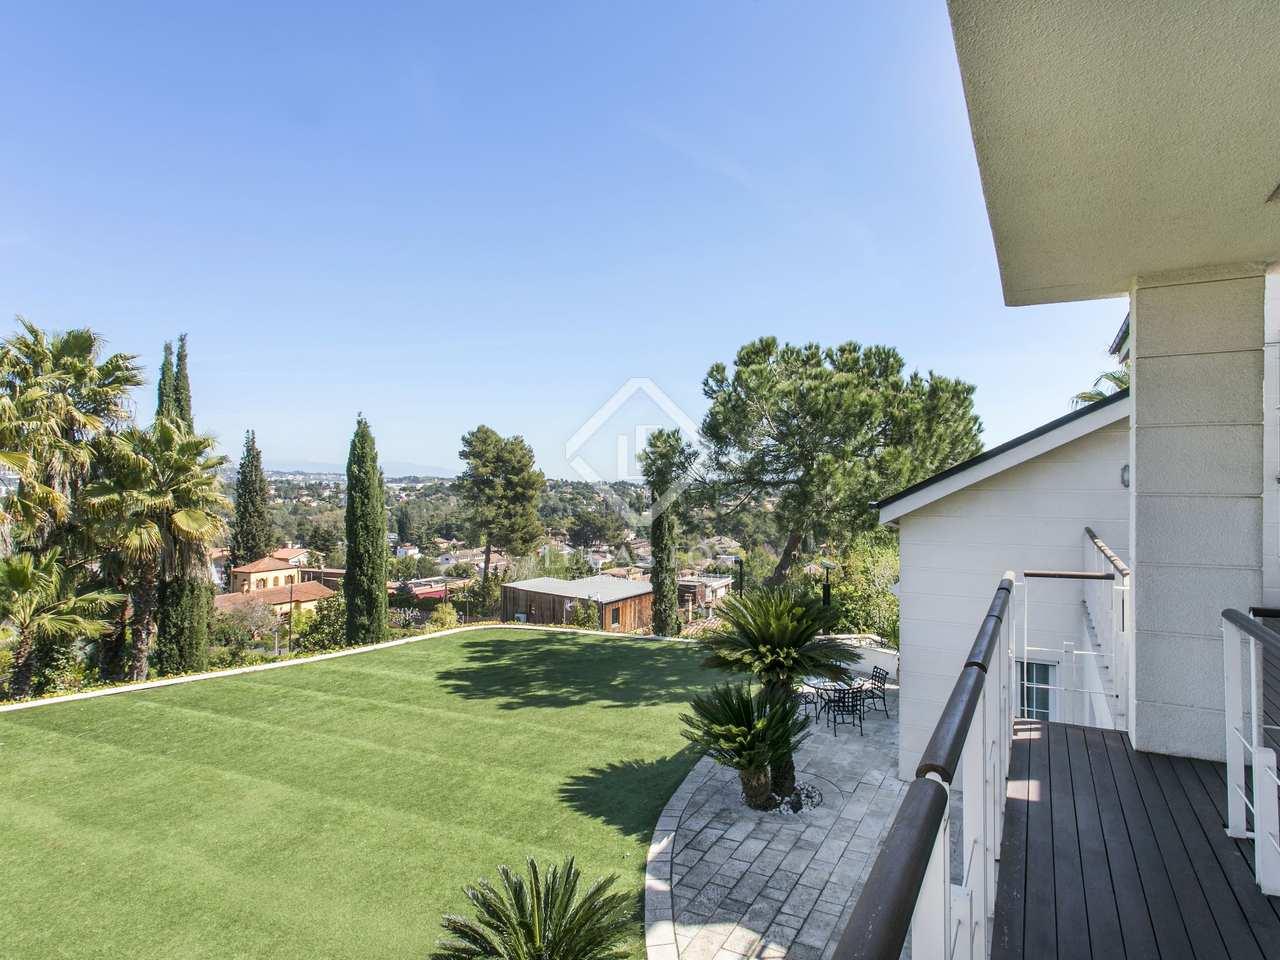 5 Bedroom House For Rent In Sant Cugat Barcelona